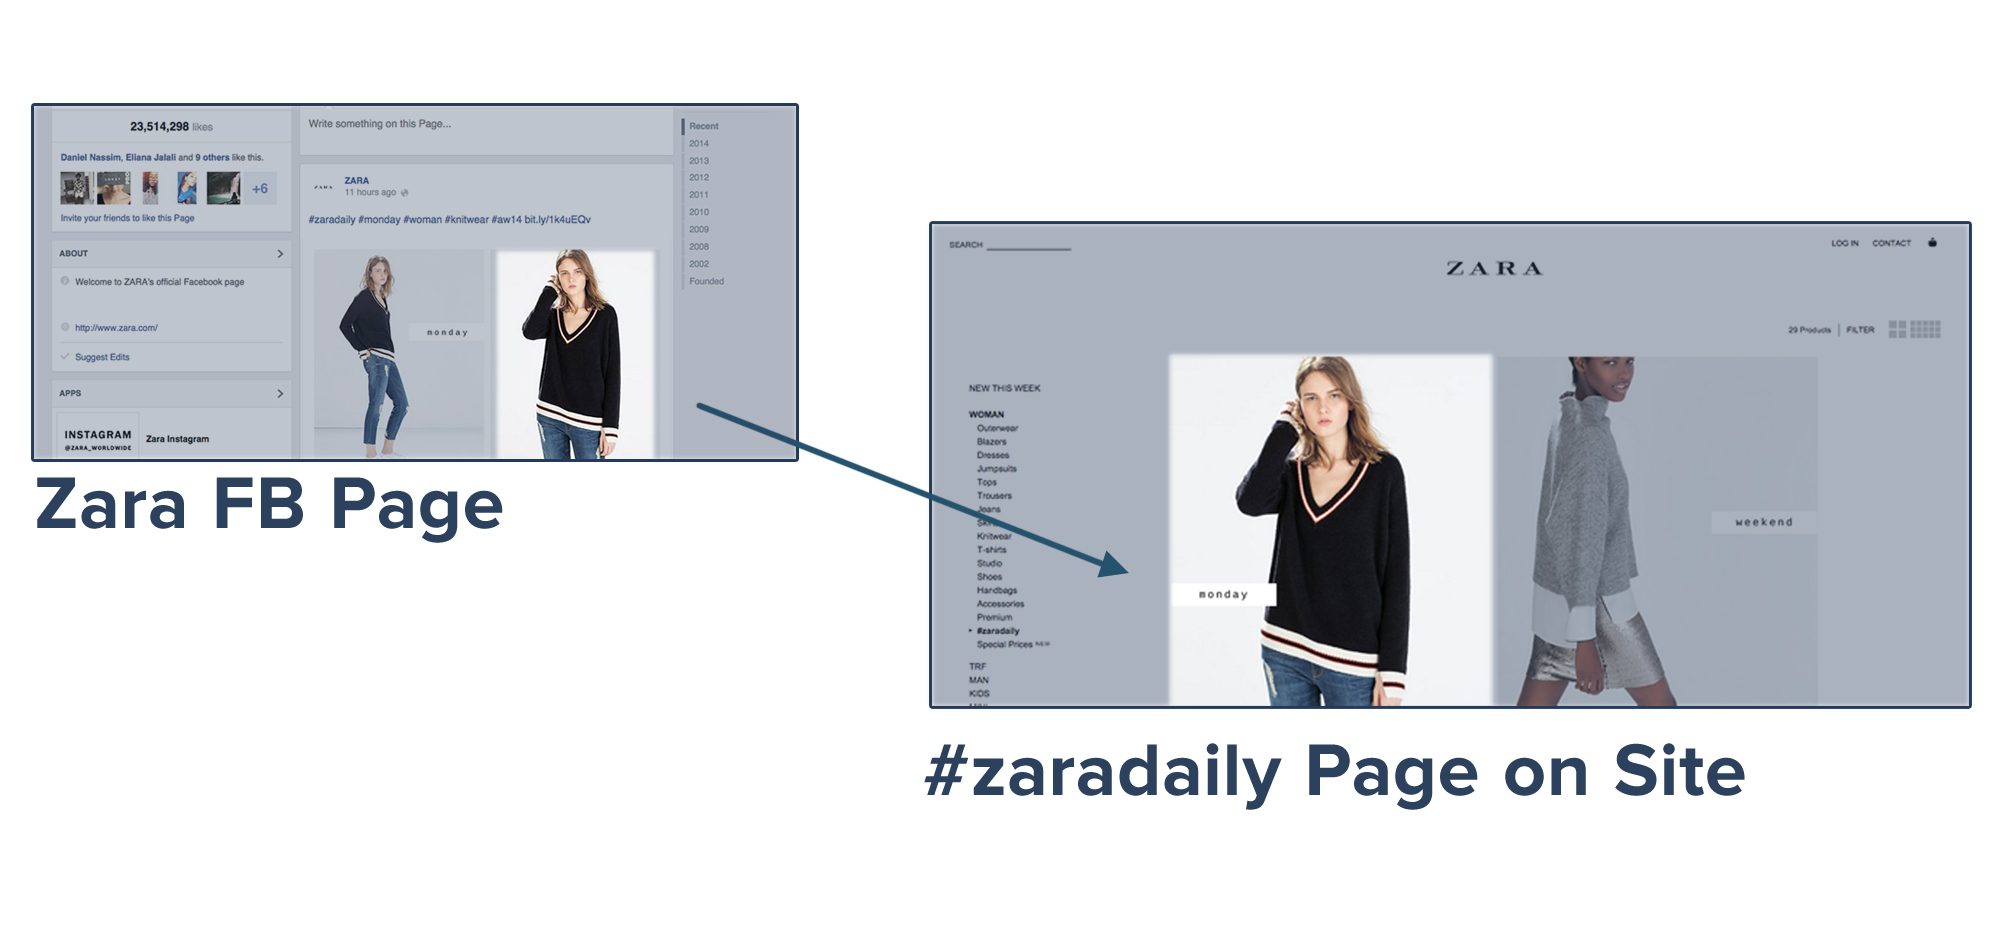 Zara Site Image